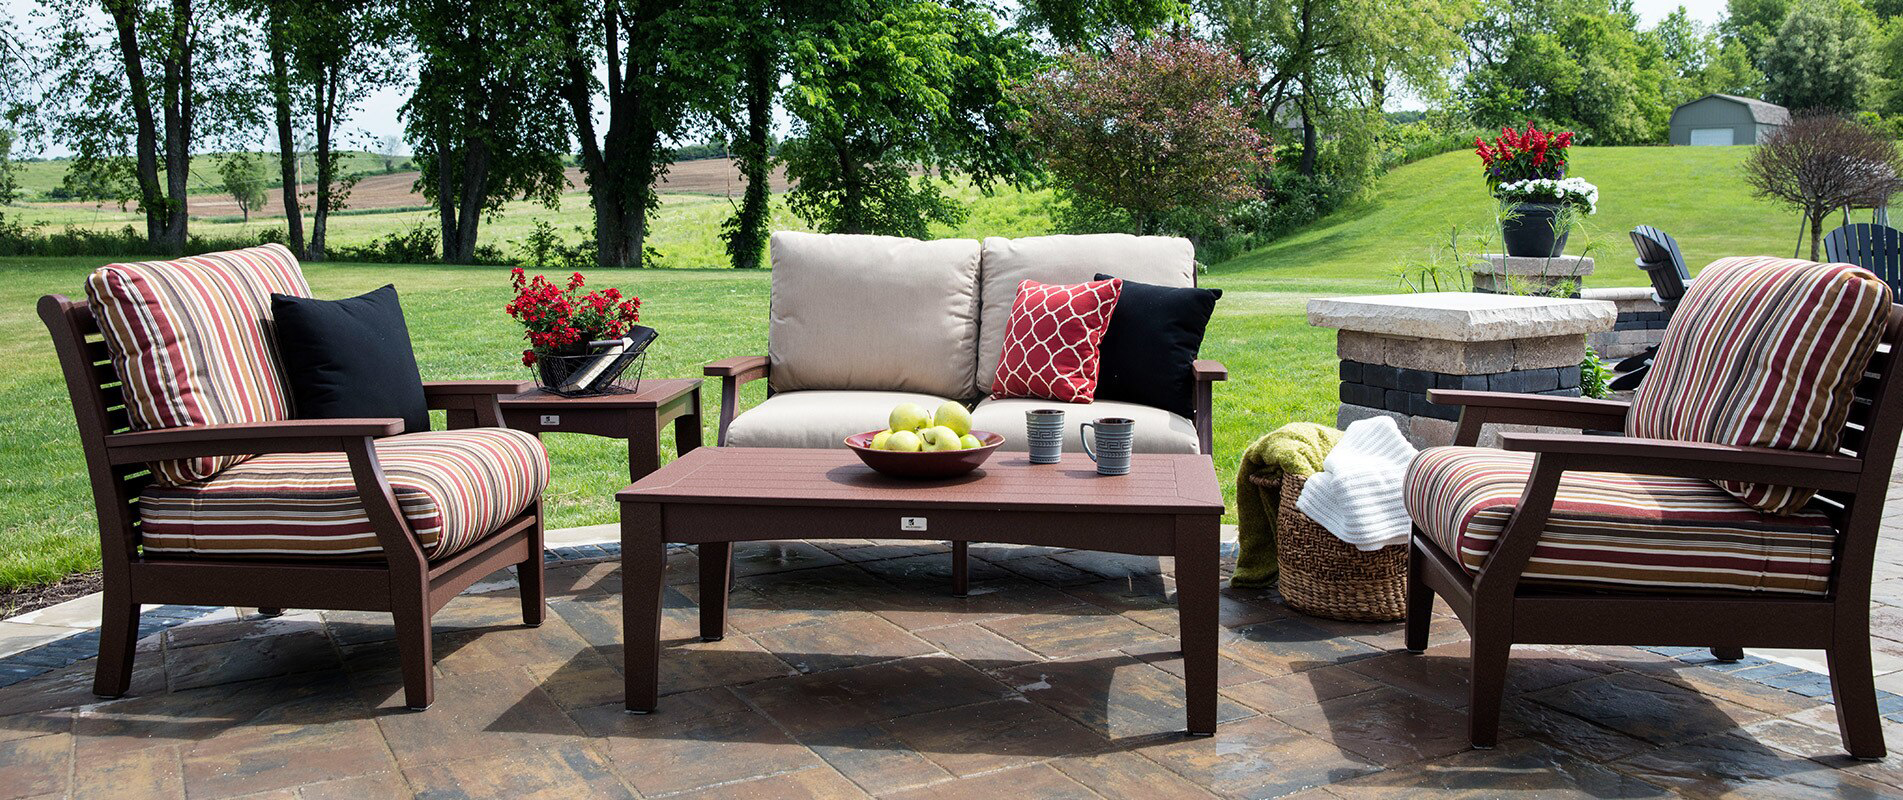 outdoor furniture backyard sheds